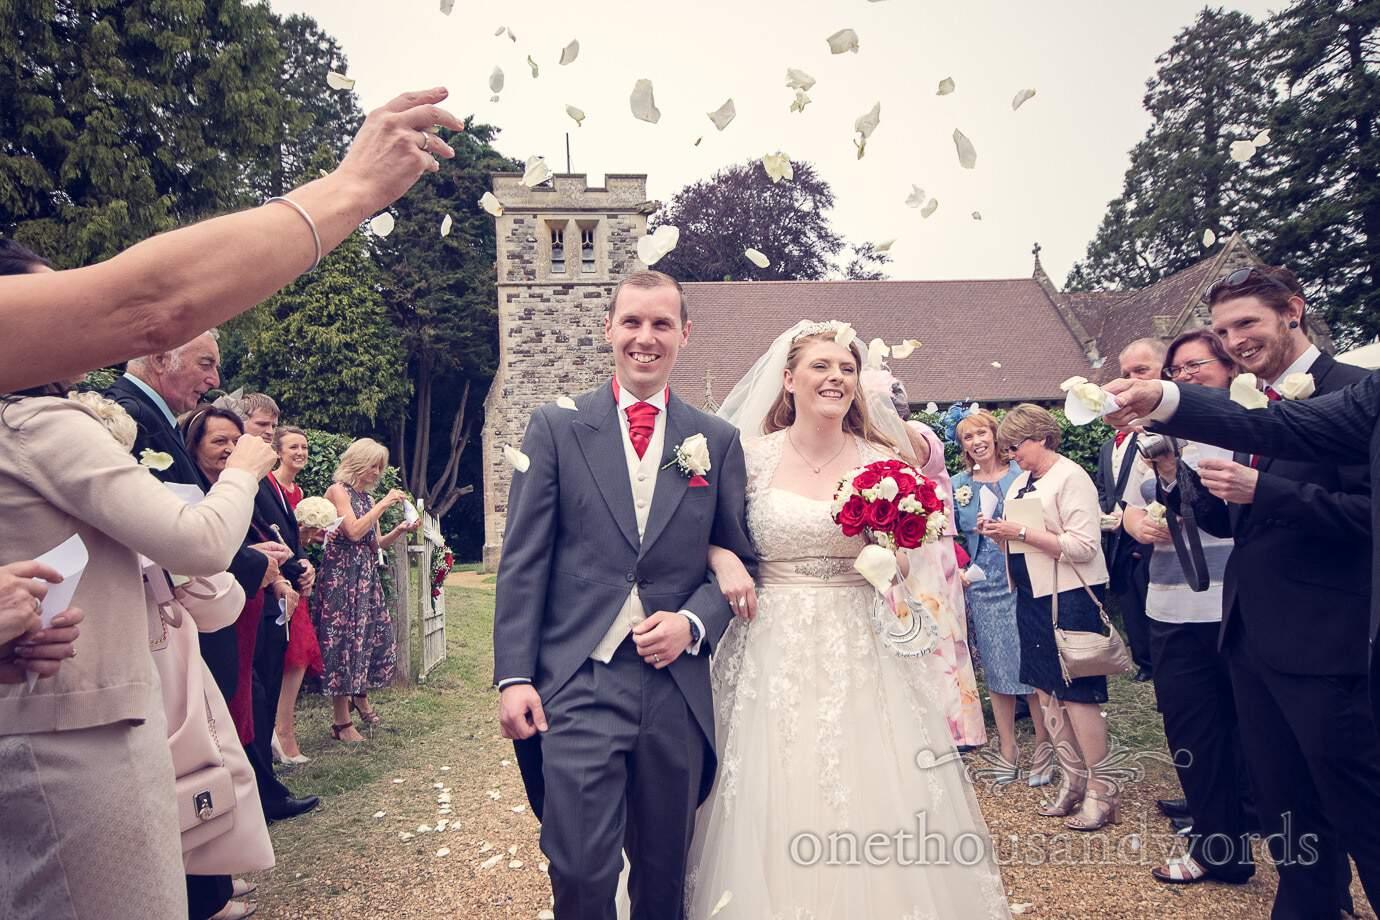 Wedding Confetti photograph at Kingston Lacy church wedding in Dorset